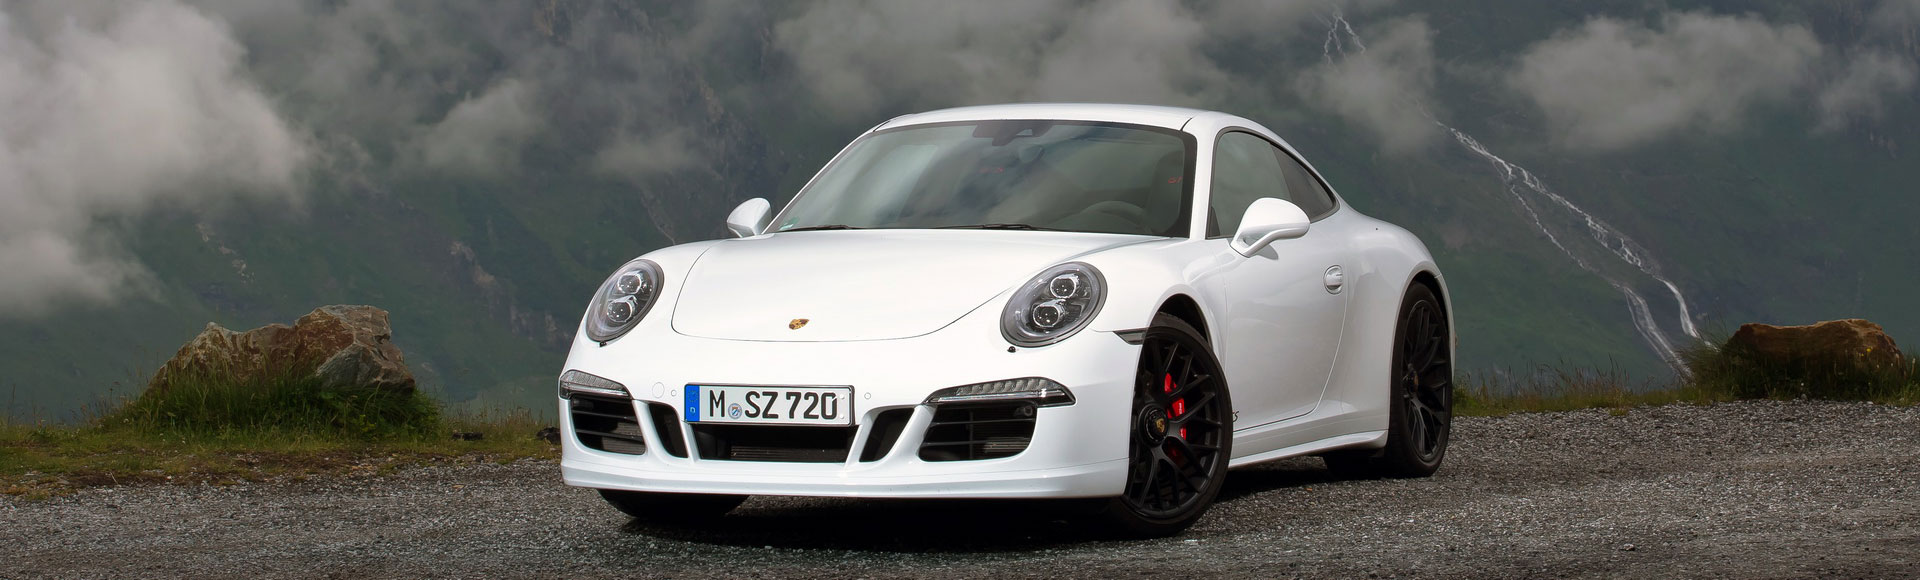 Porsche 991 GTS Coupe 2015 Herbst 067